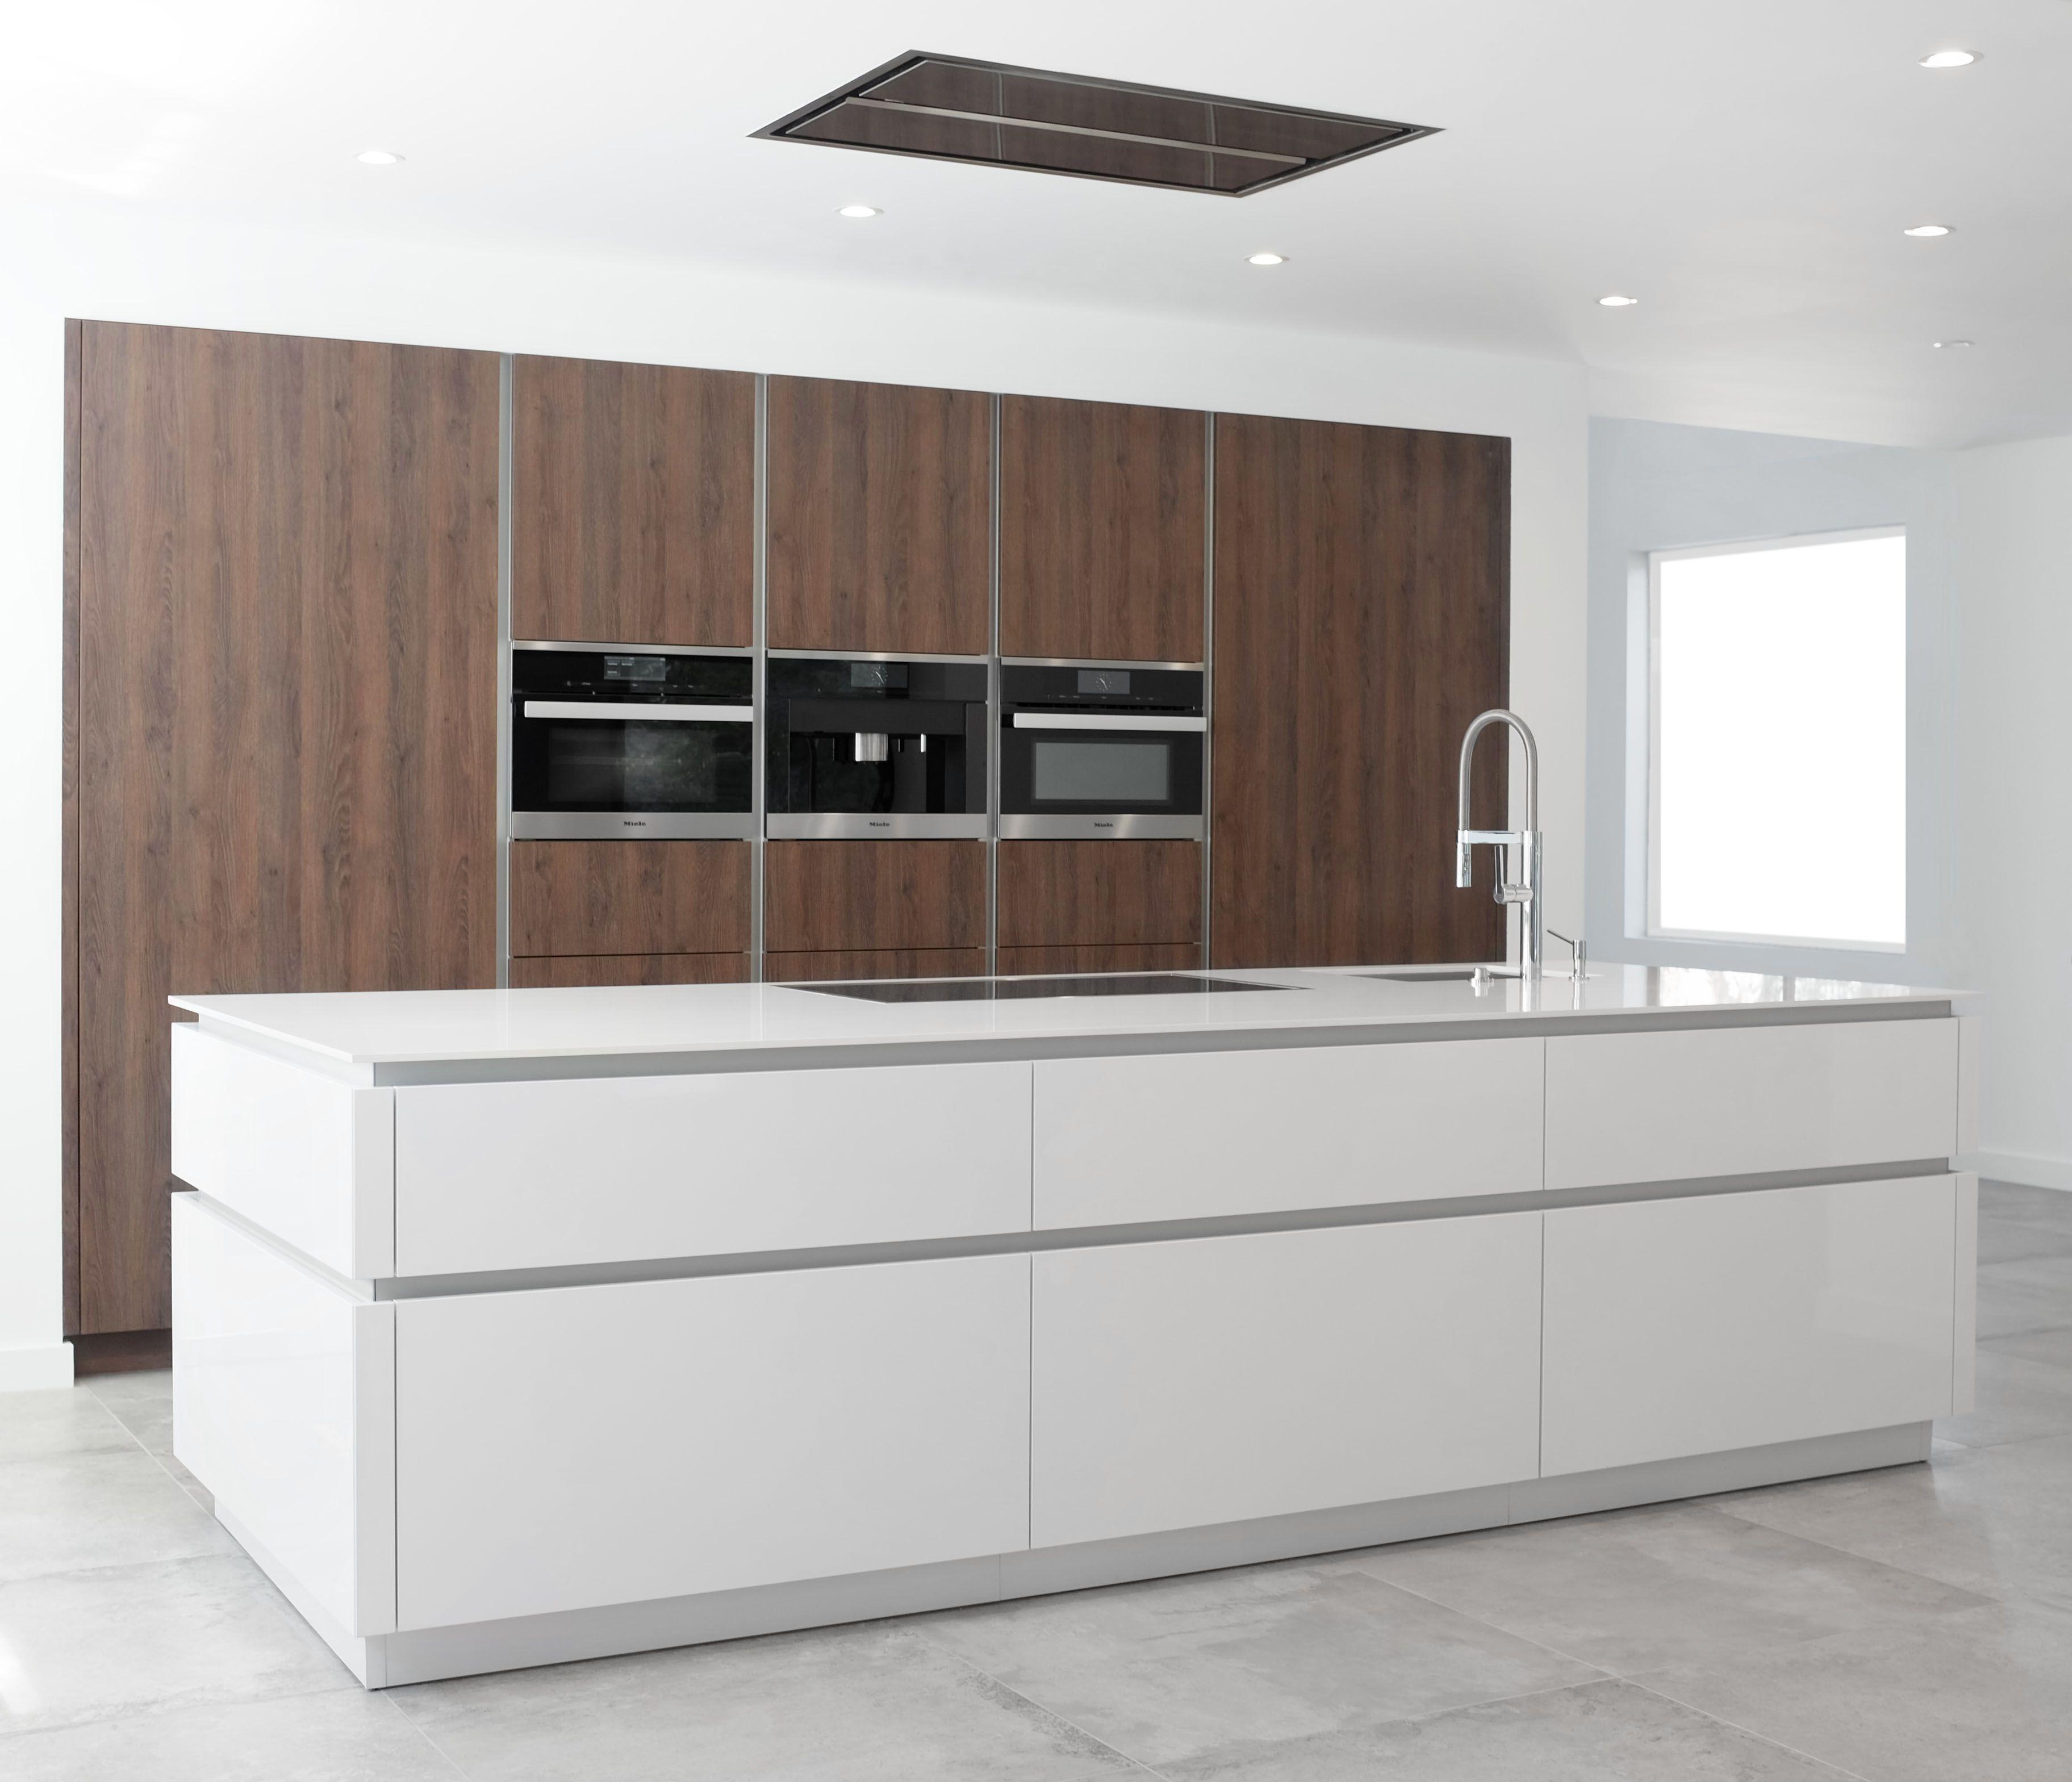 Favoriete Wildhagen | Strakke moderne keuken met houten kasten wand en #KK79